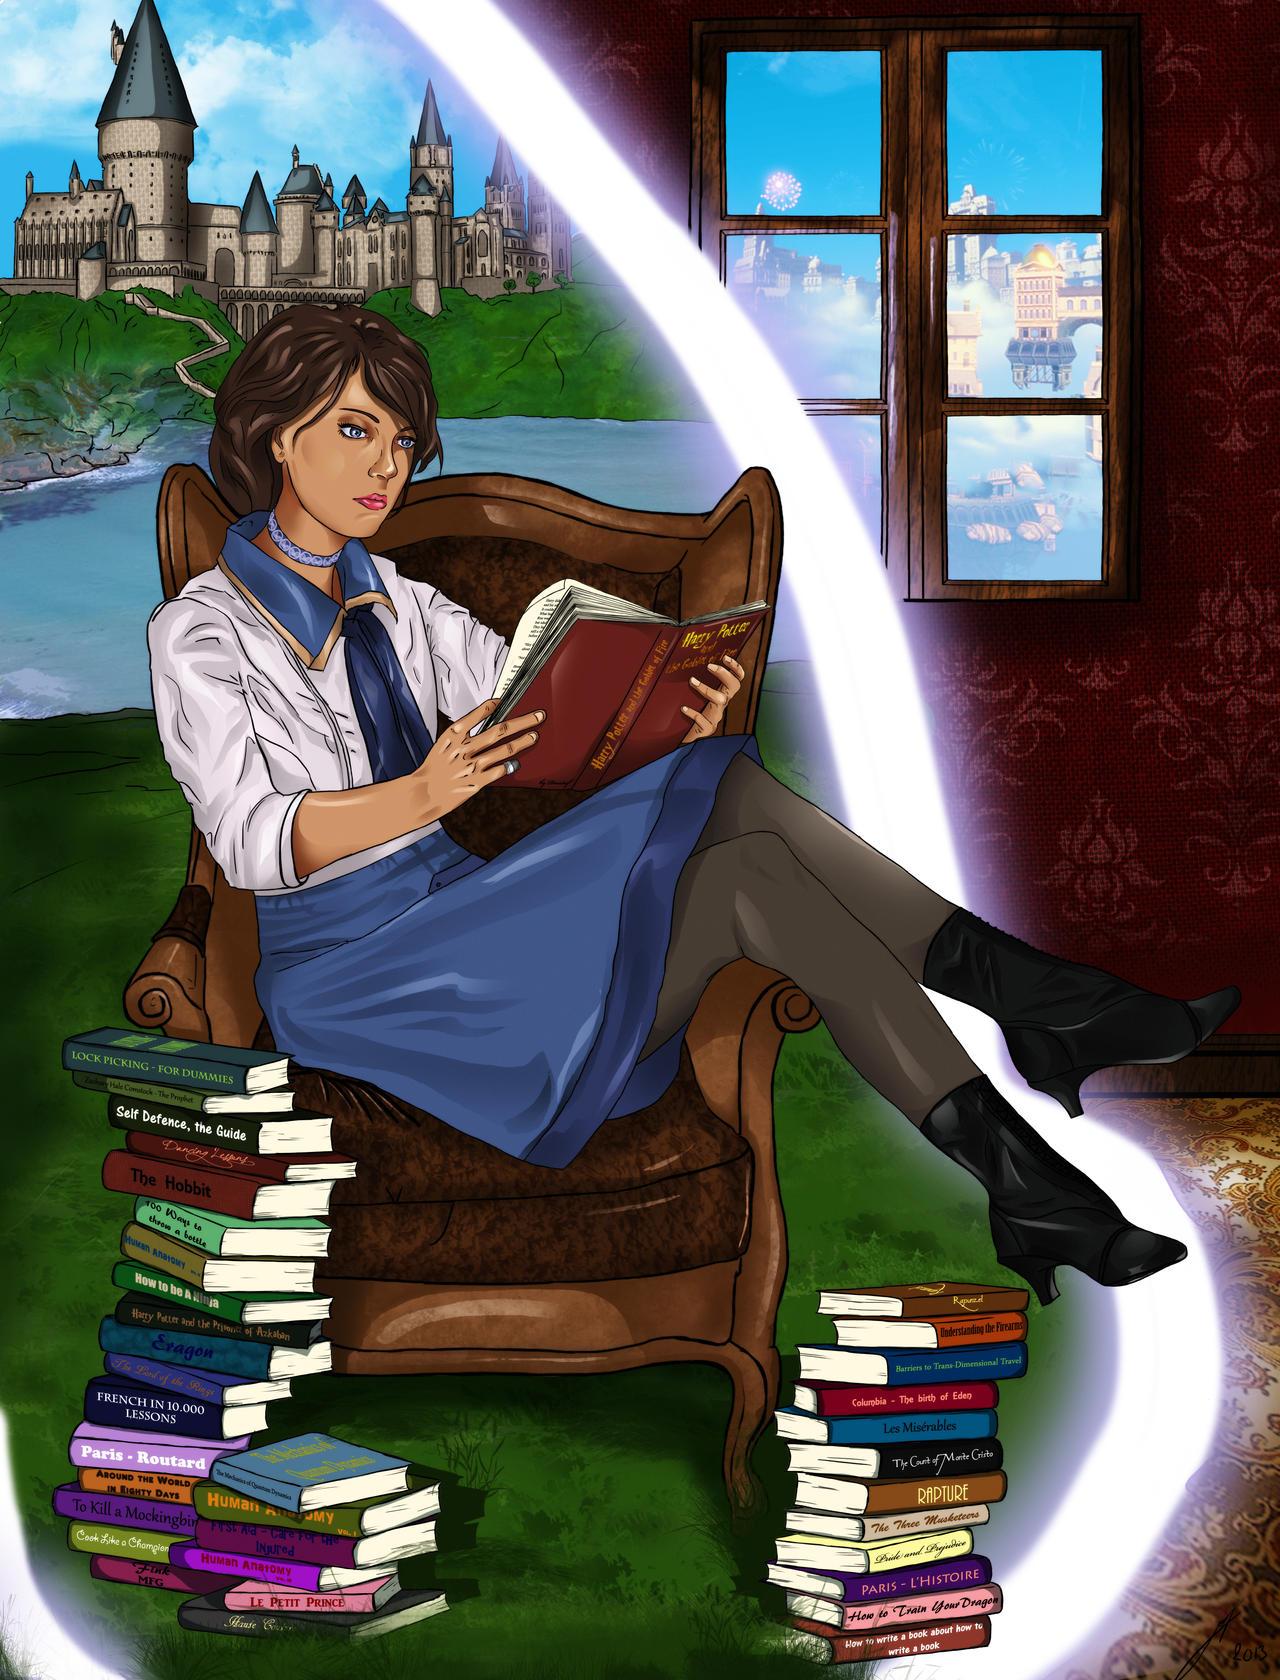 elizabeth___i_ve_read_a_lot__mr__dewitt_by_daistaf-d654vd9.jpg